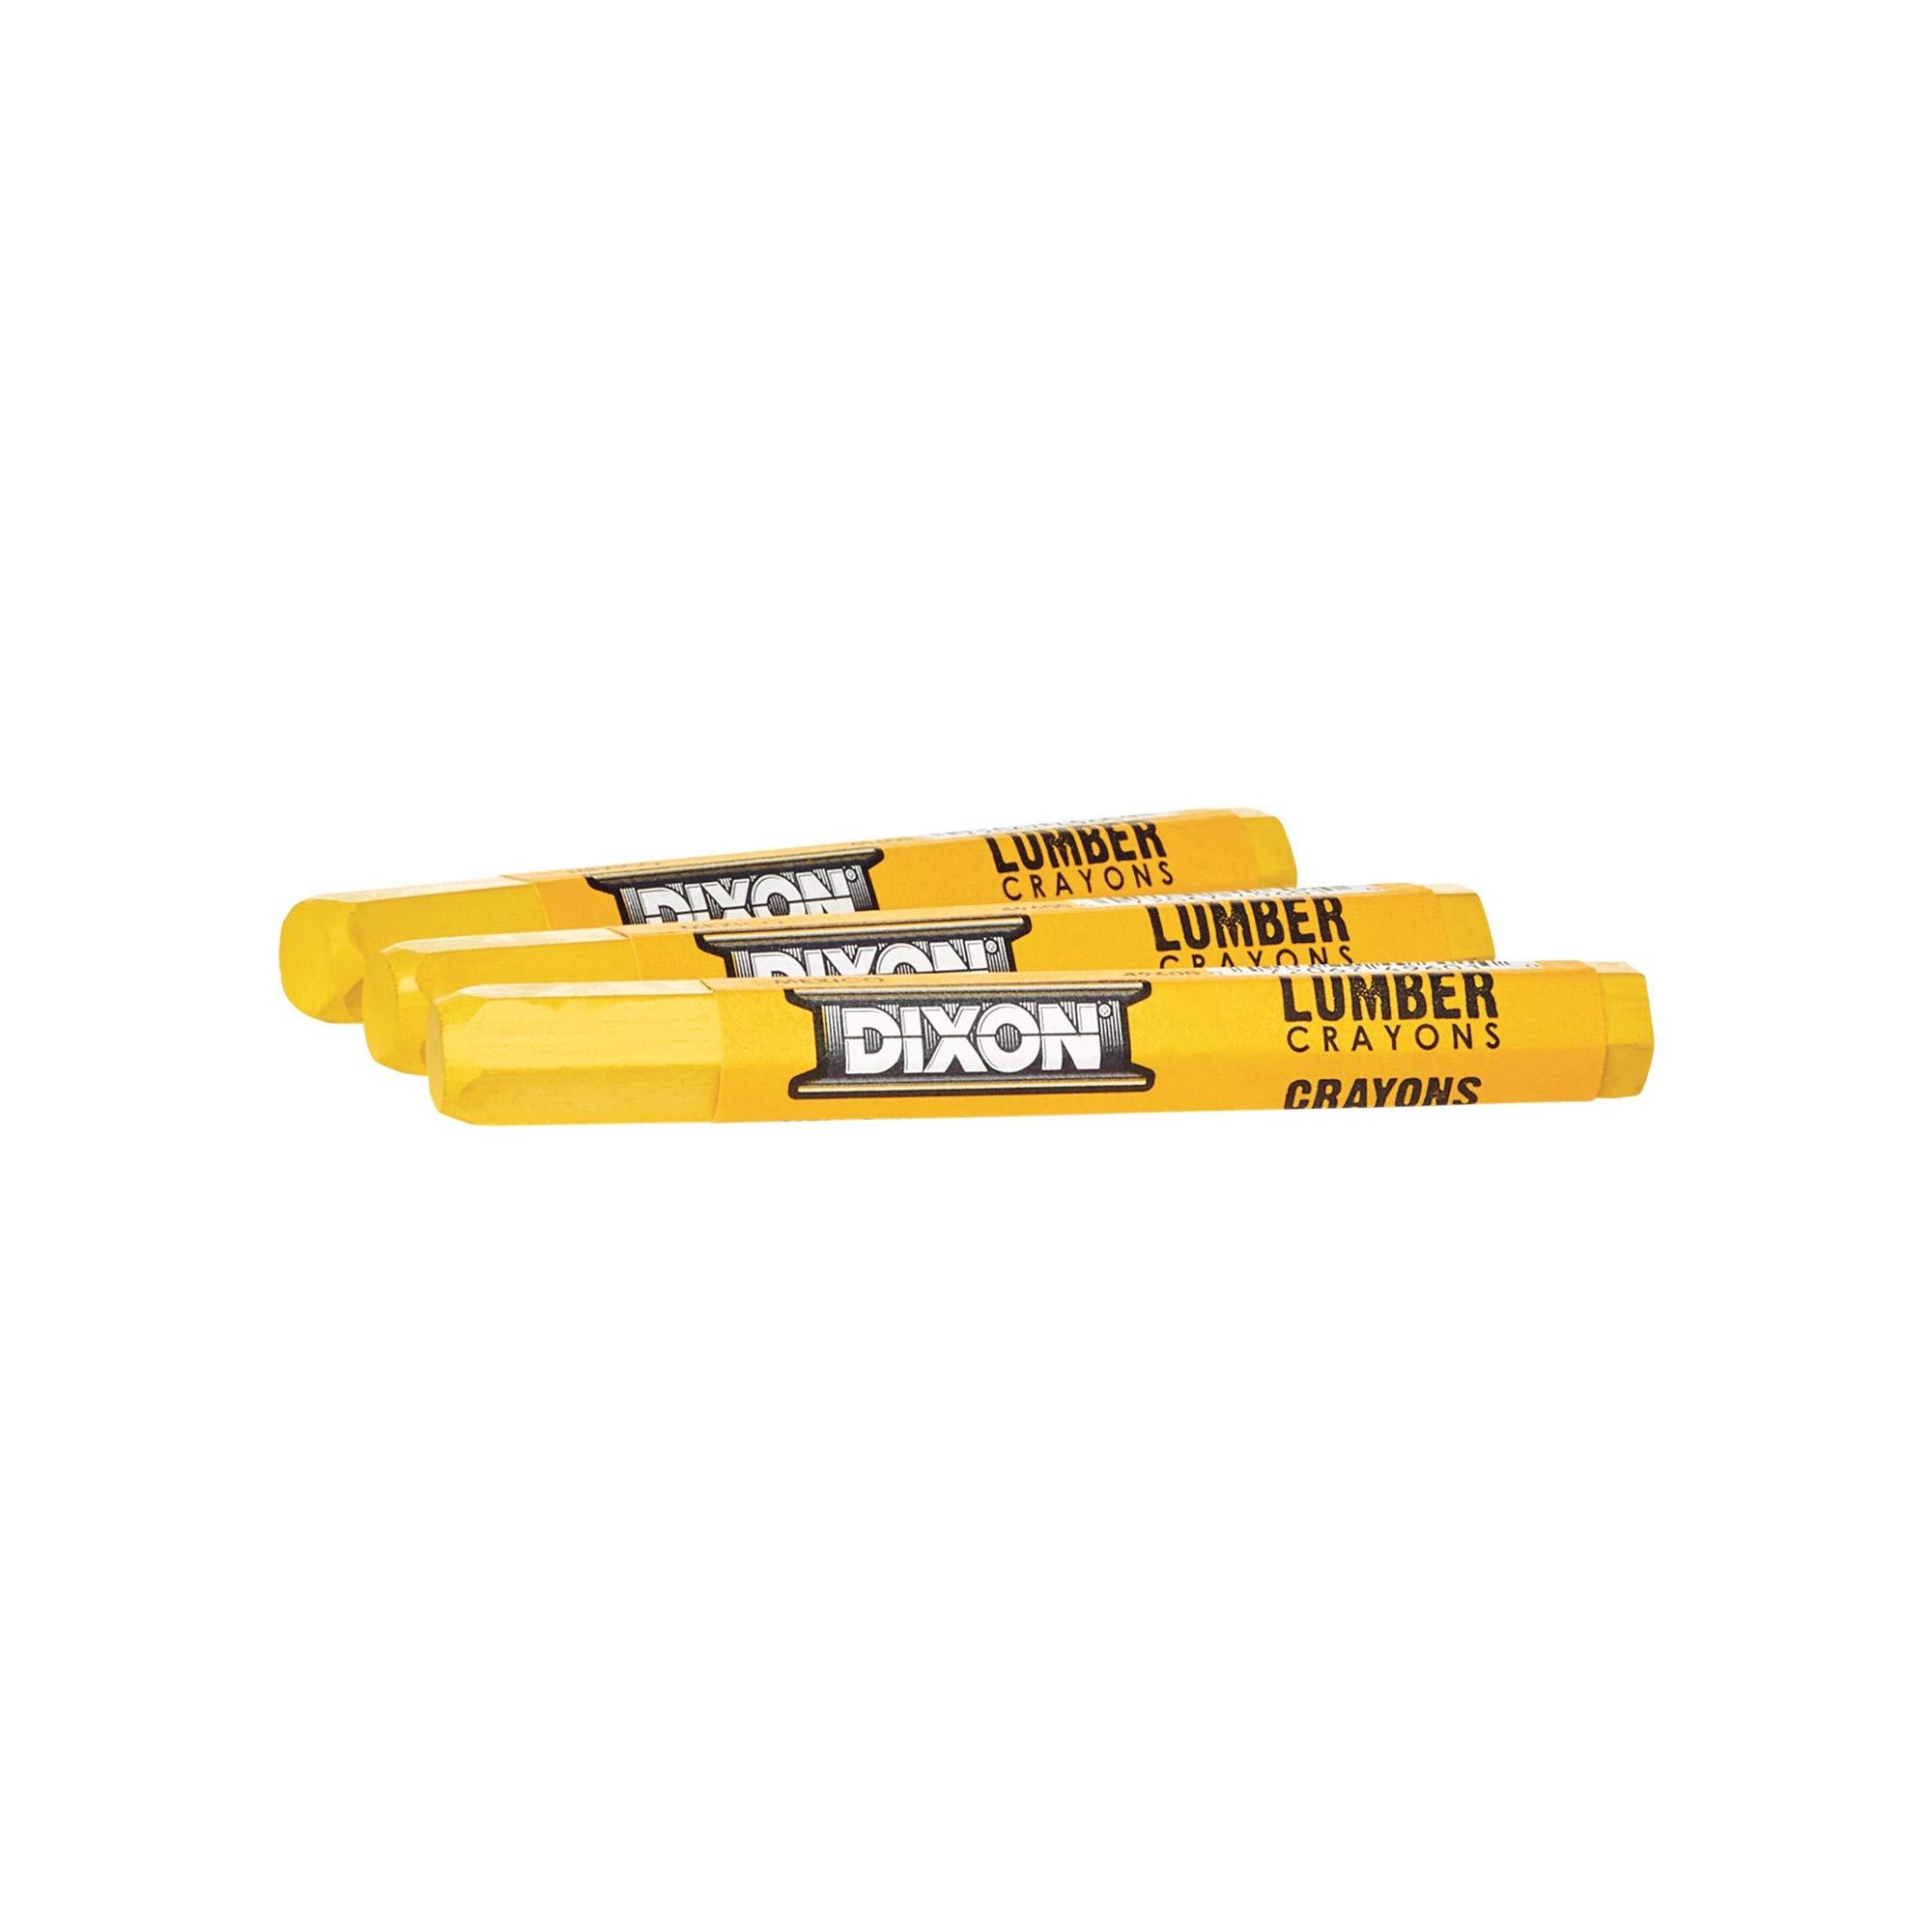 Dixon Industrial Lumber Marking Crayons, 4.5'' x 1/2'' Hex, Yellow, 12-Pack (49600)